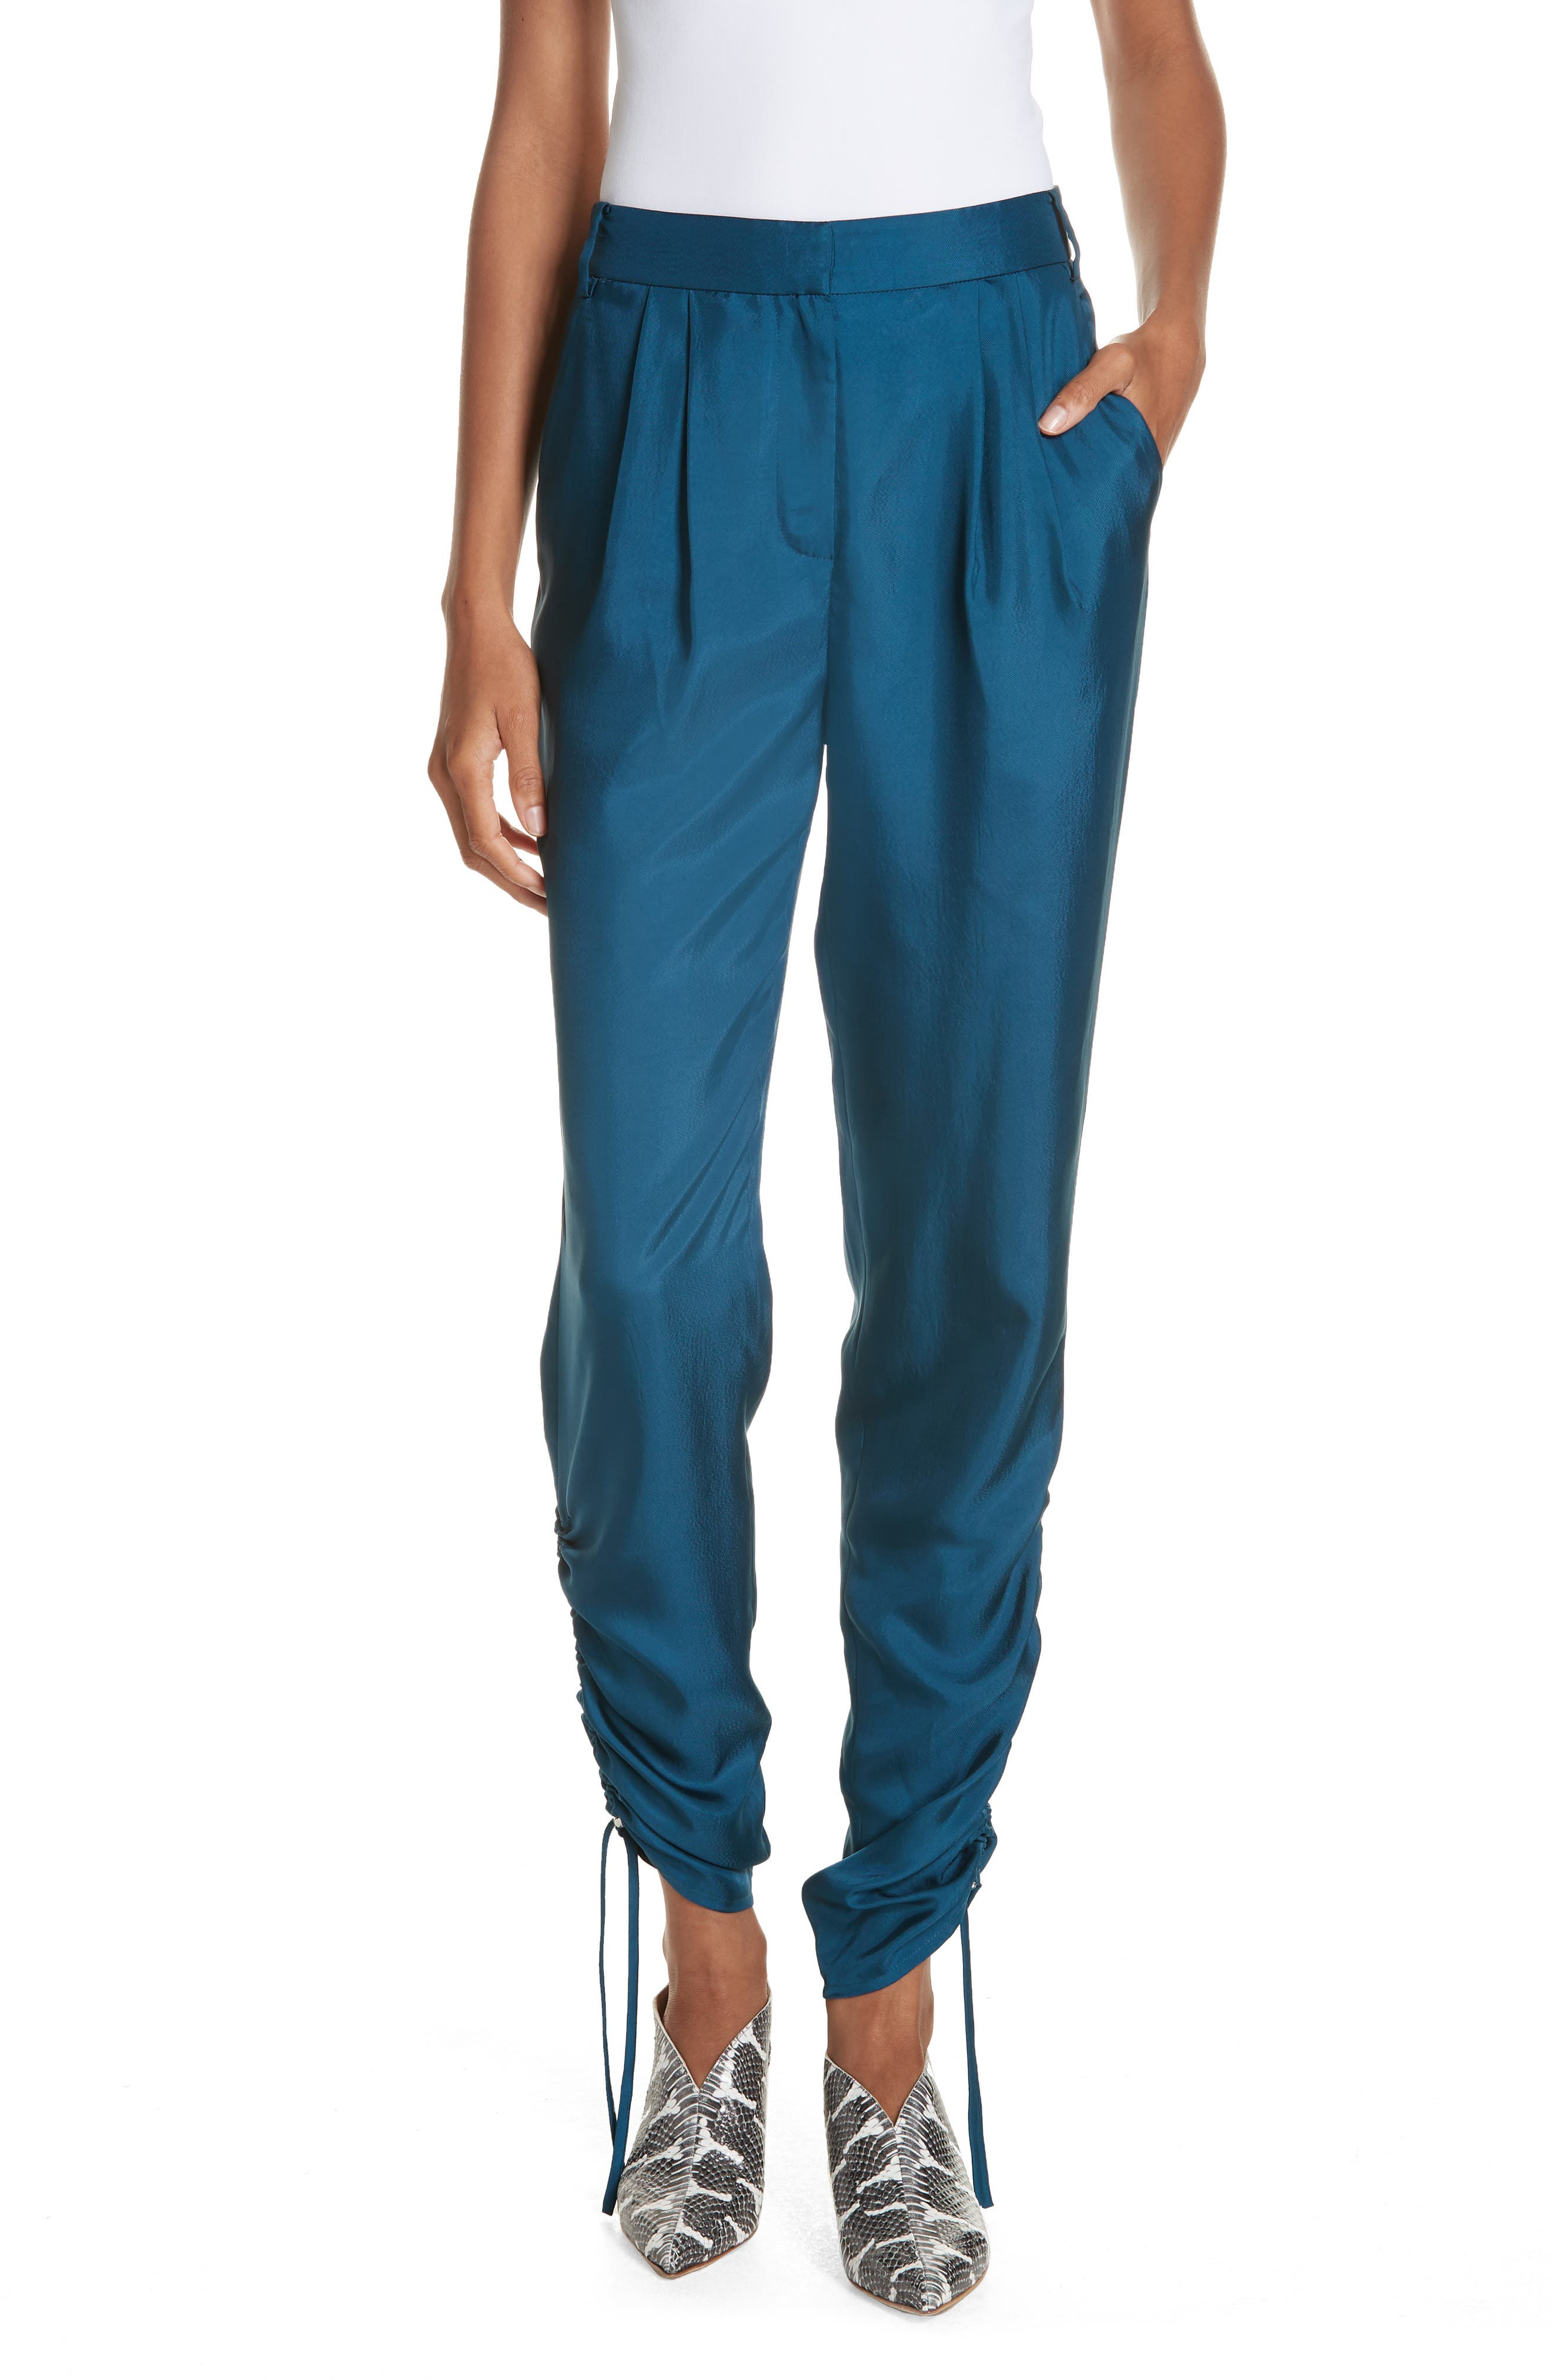 Mendini Twill Shirred Pants,                             Main thumbnail 1, color,                             TEAL BLUE